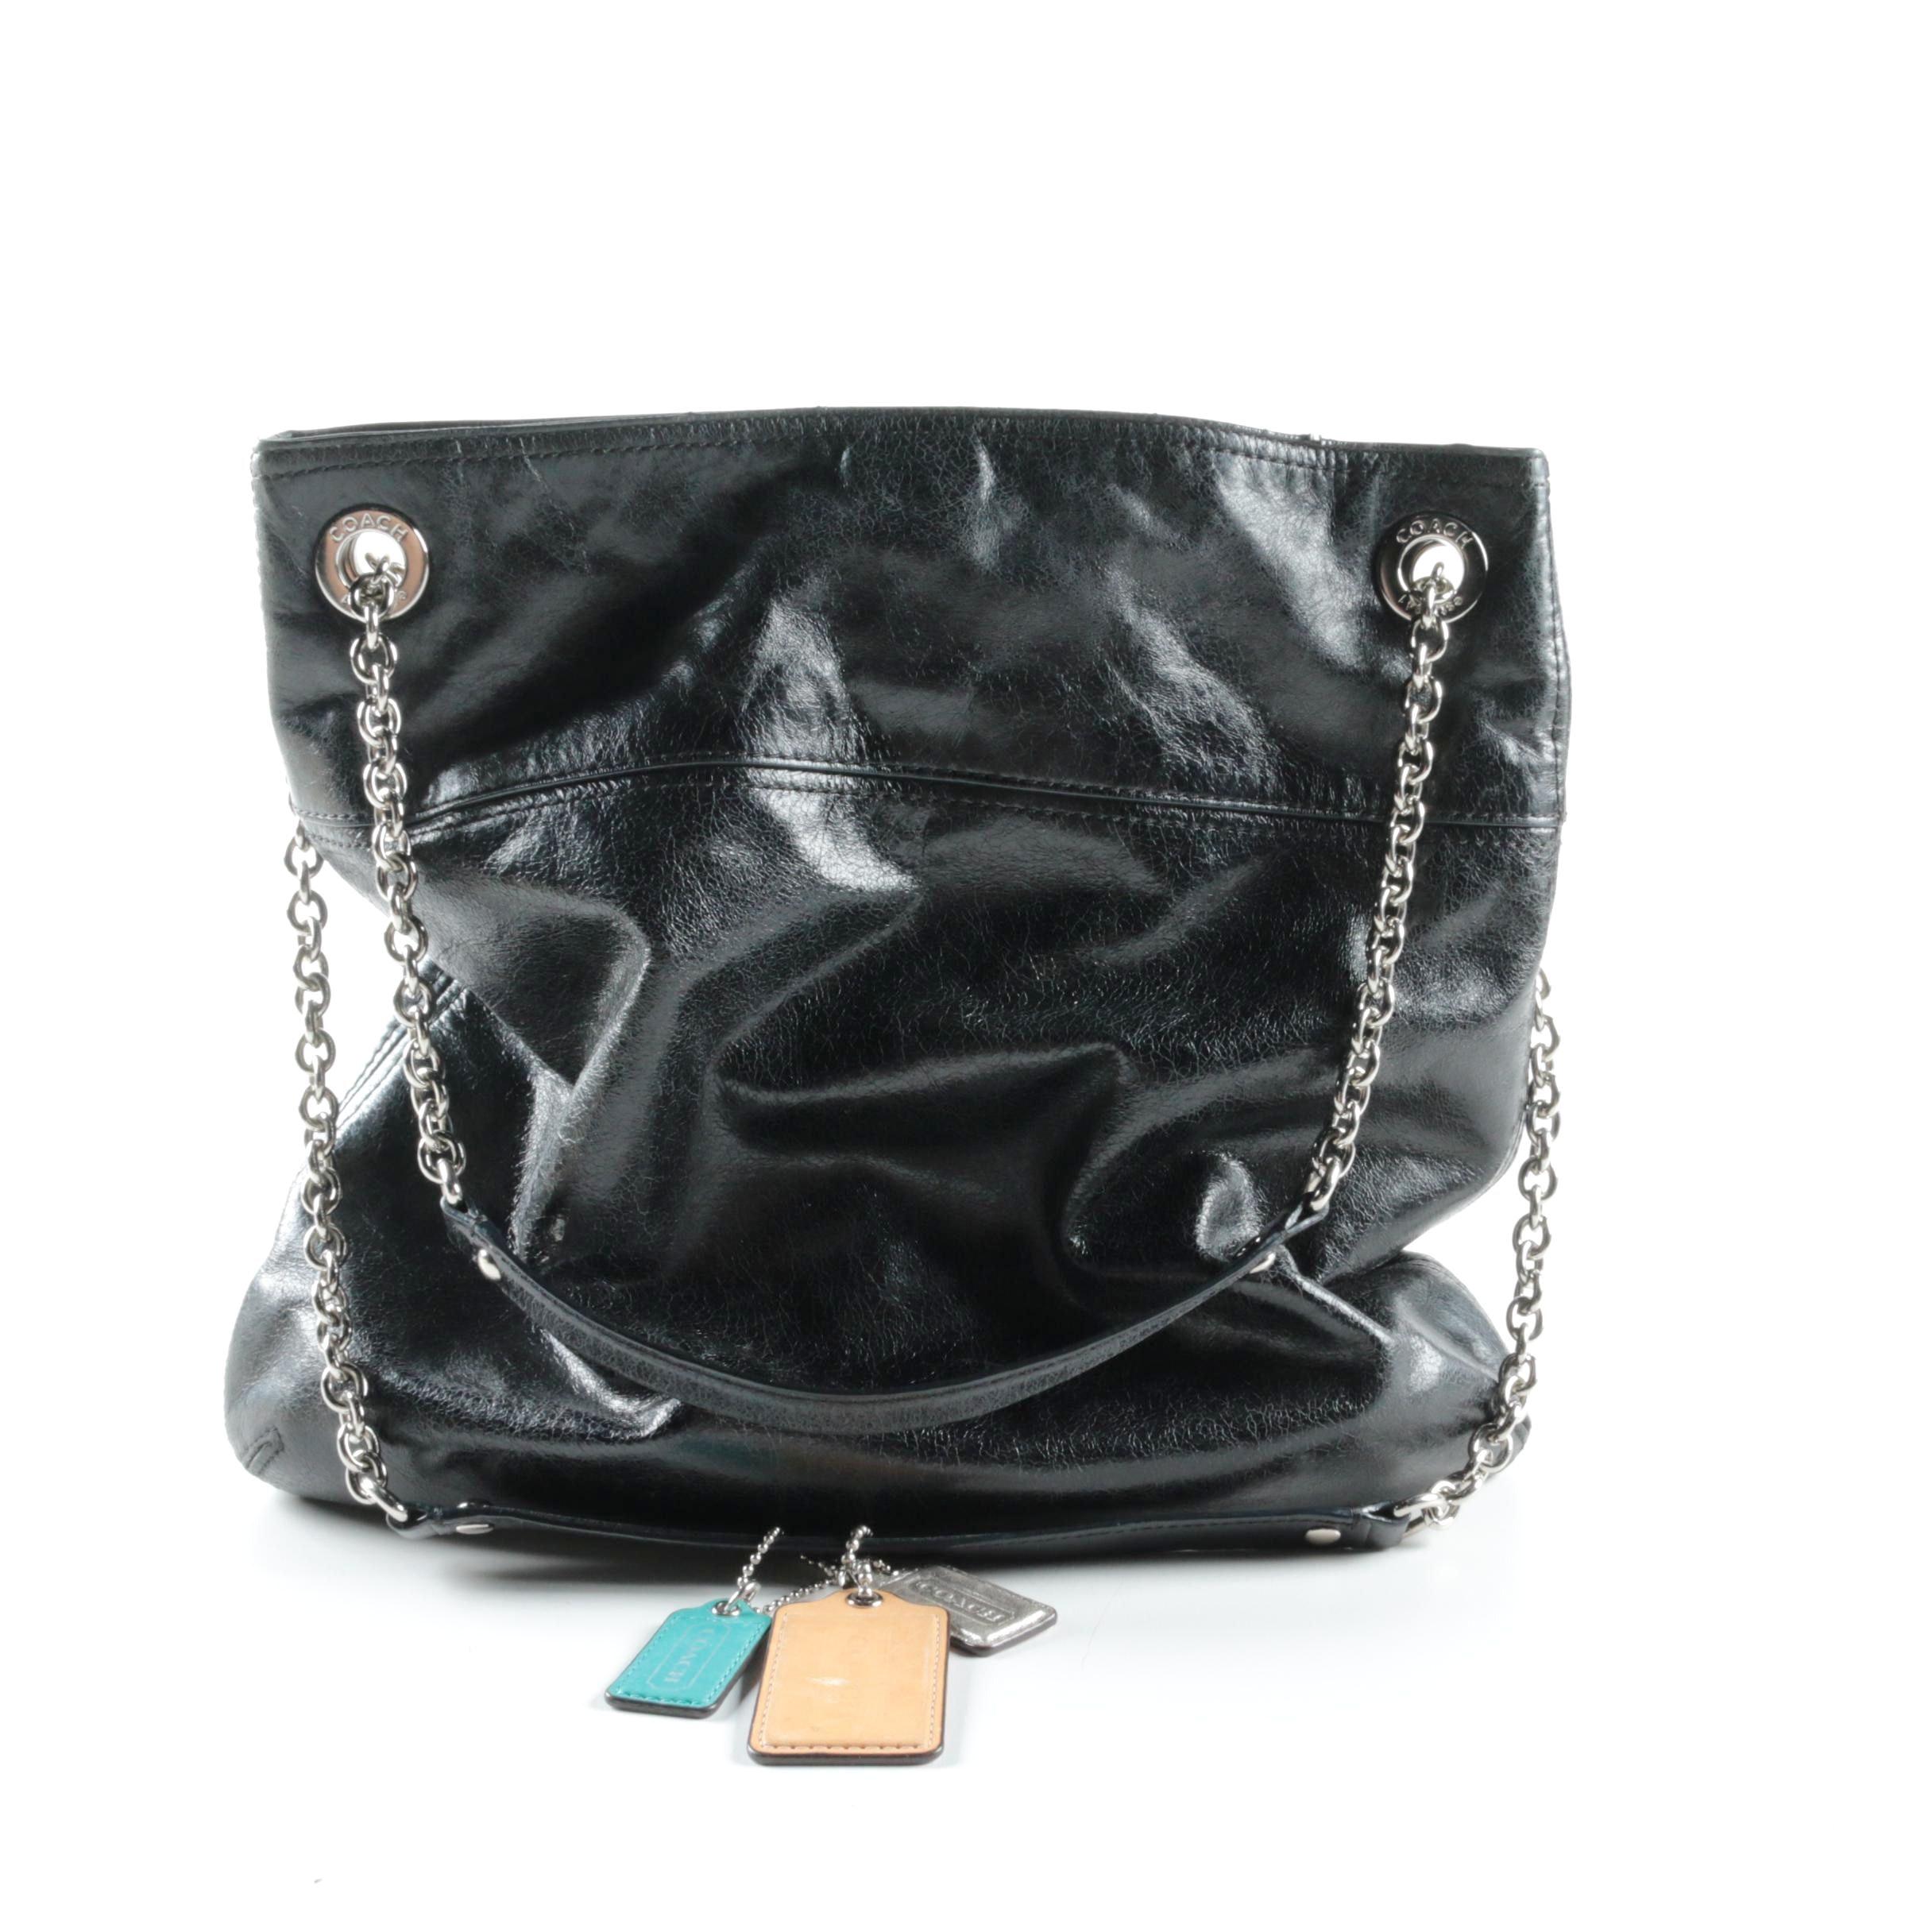 Coach Poppy Chain Handle Black Leather Shoulder Bag